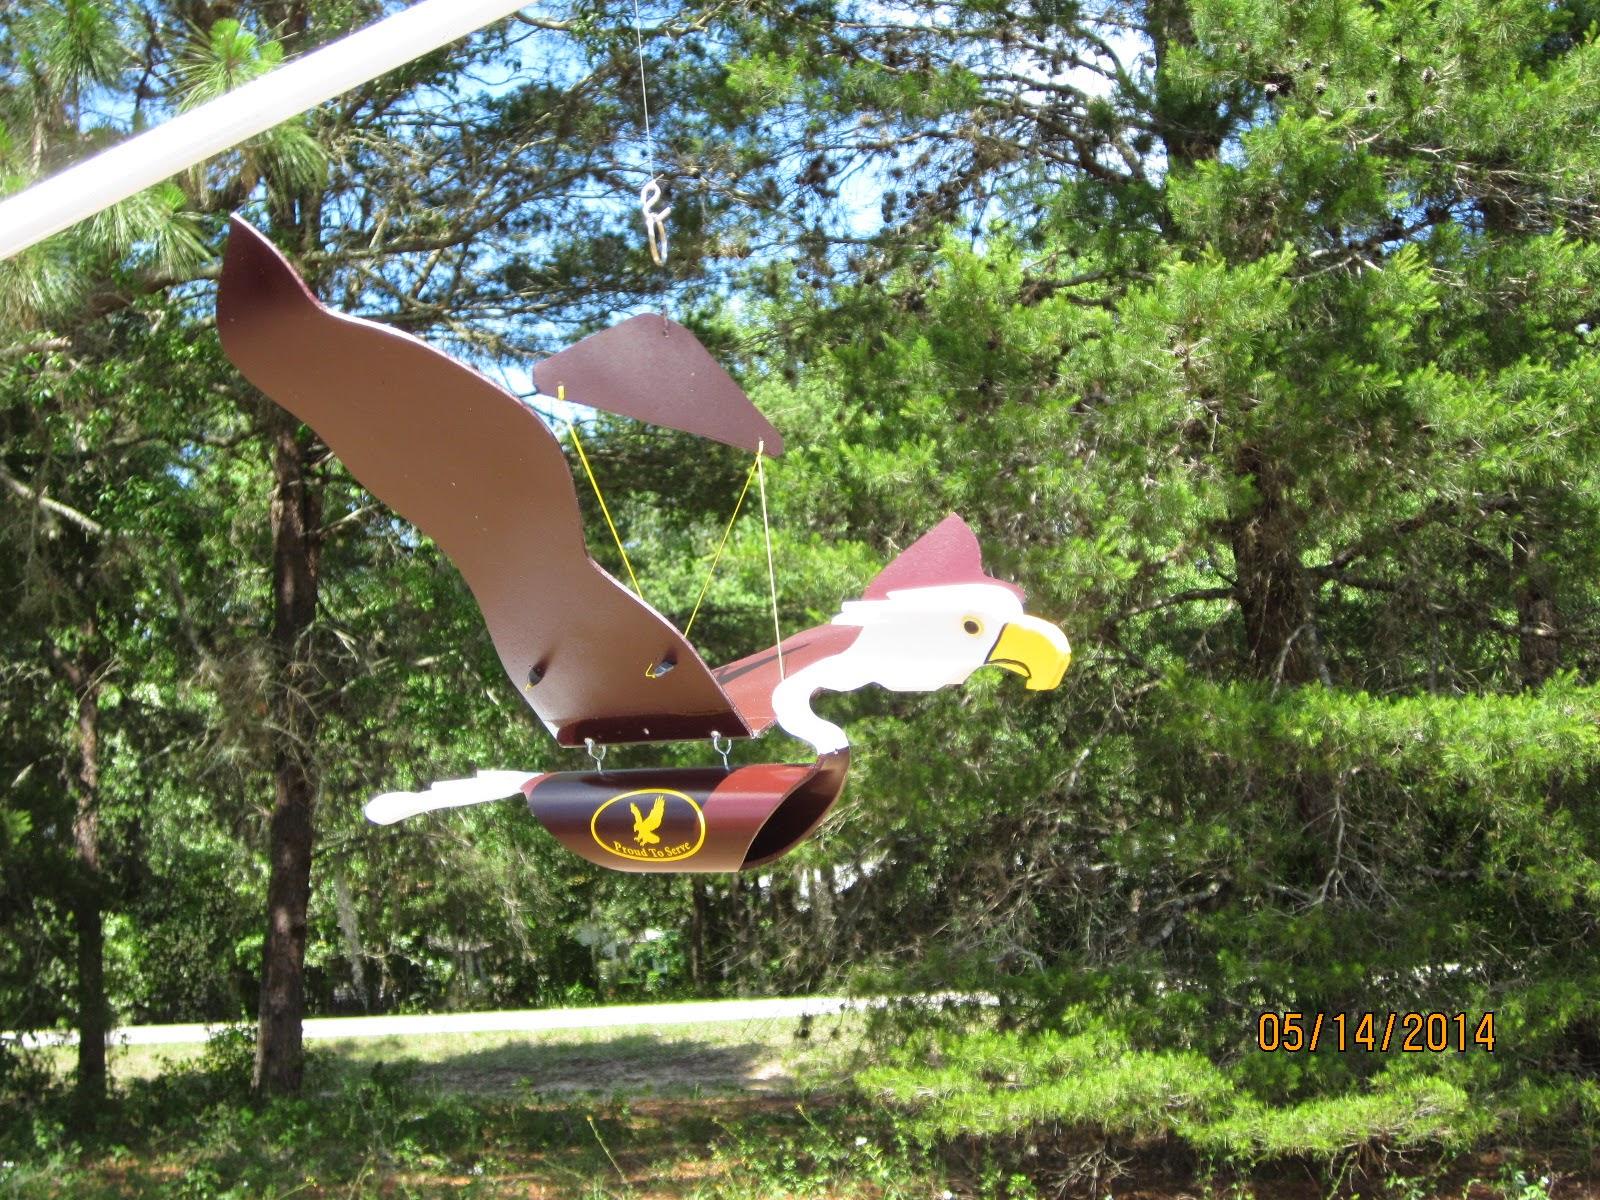 PVC Pipe Birds: American Legion Pvc Eagles